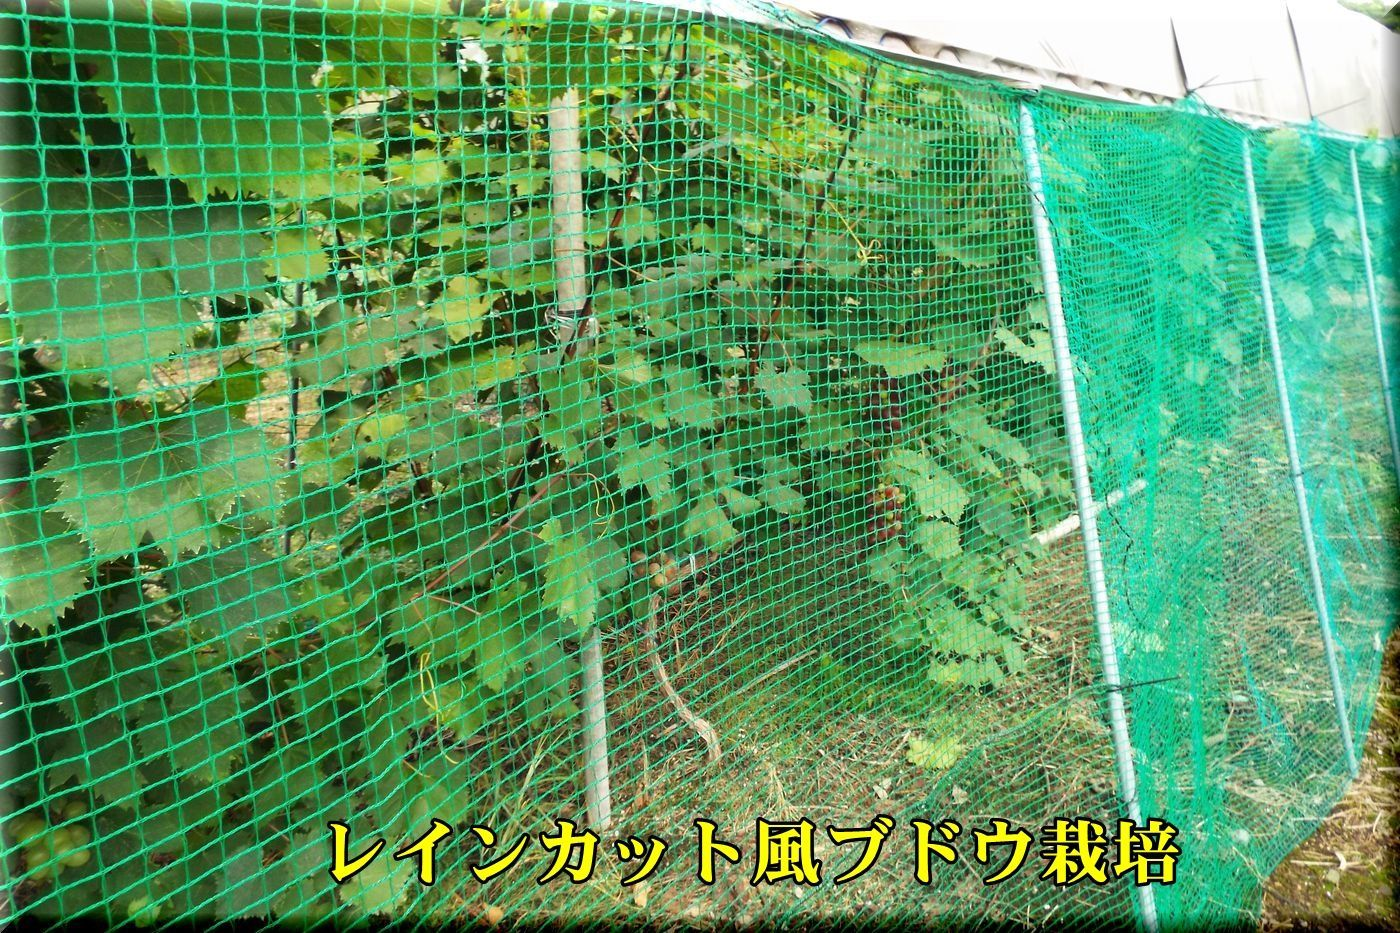 1raincut170819_019.jpg